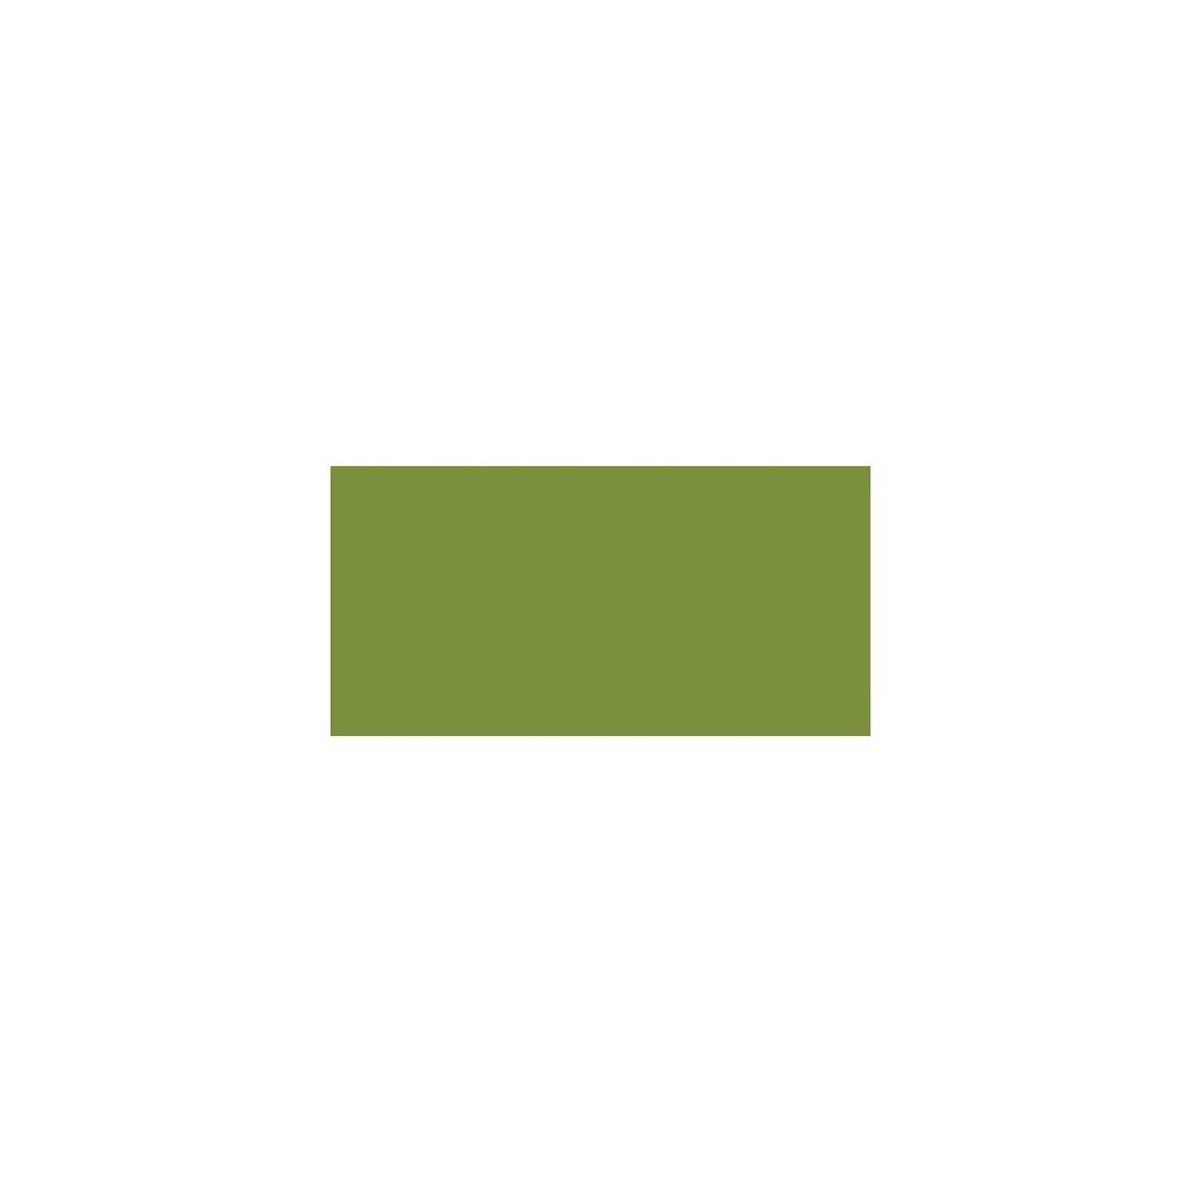 Reinker; Leaf Green